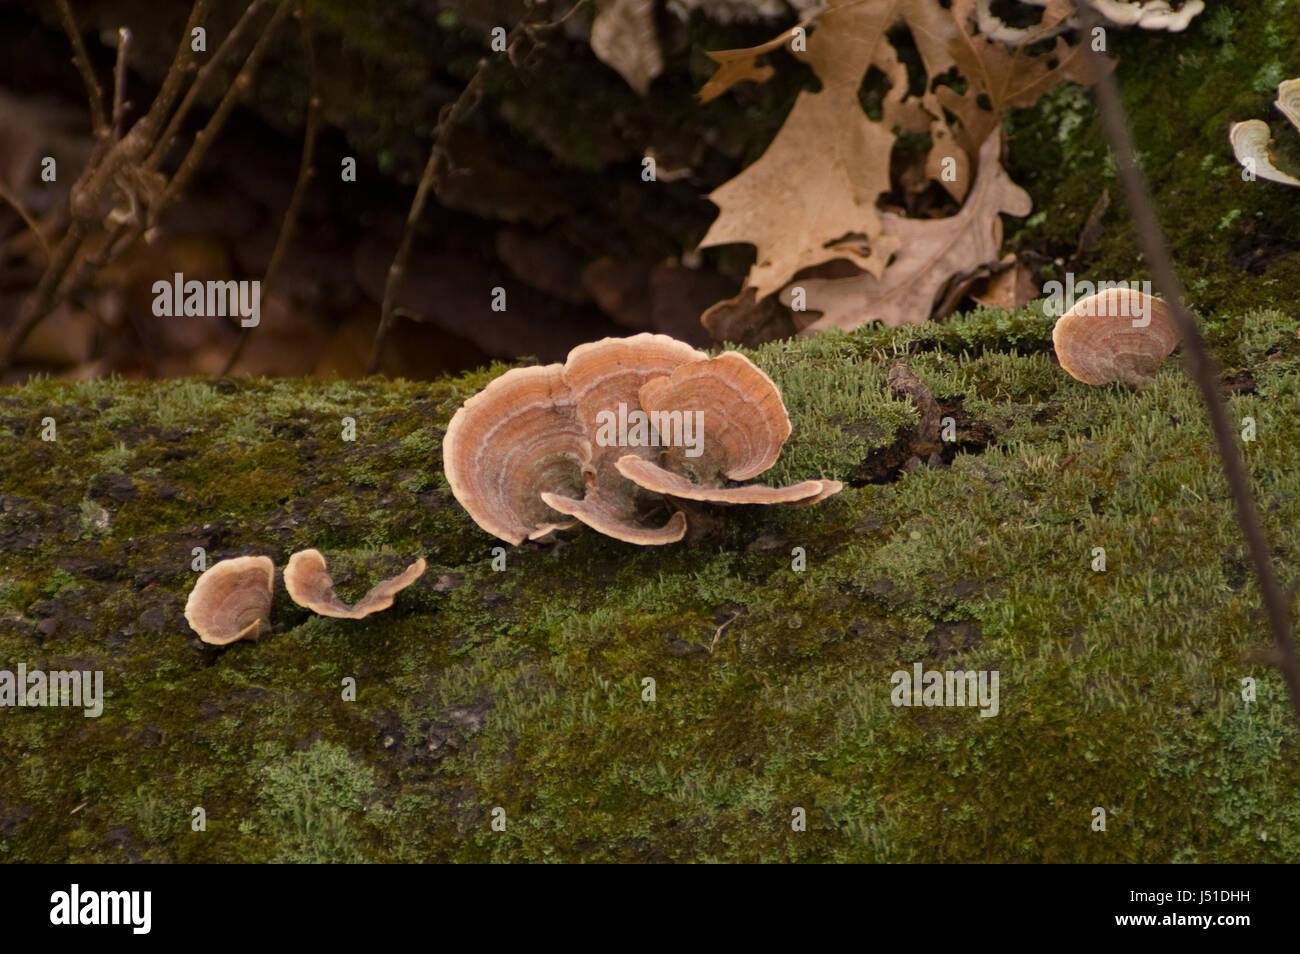 Turkey Tail Fungus (tramete versicolor) on a log. - Stock Image